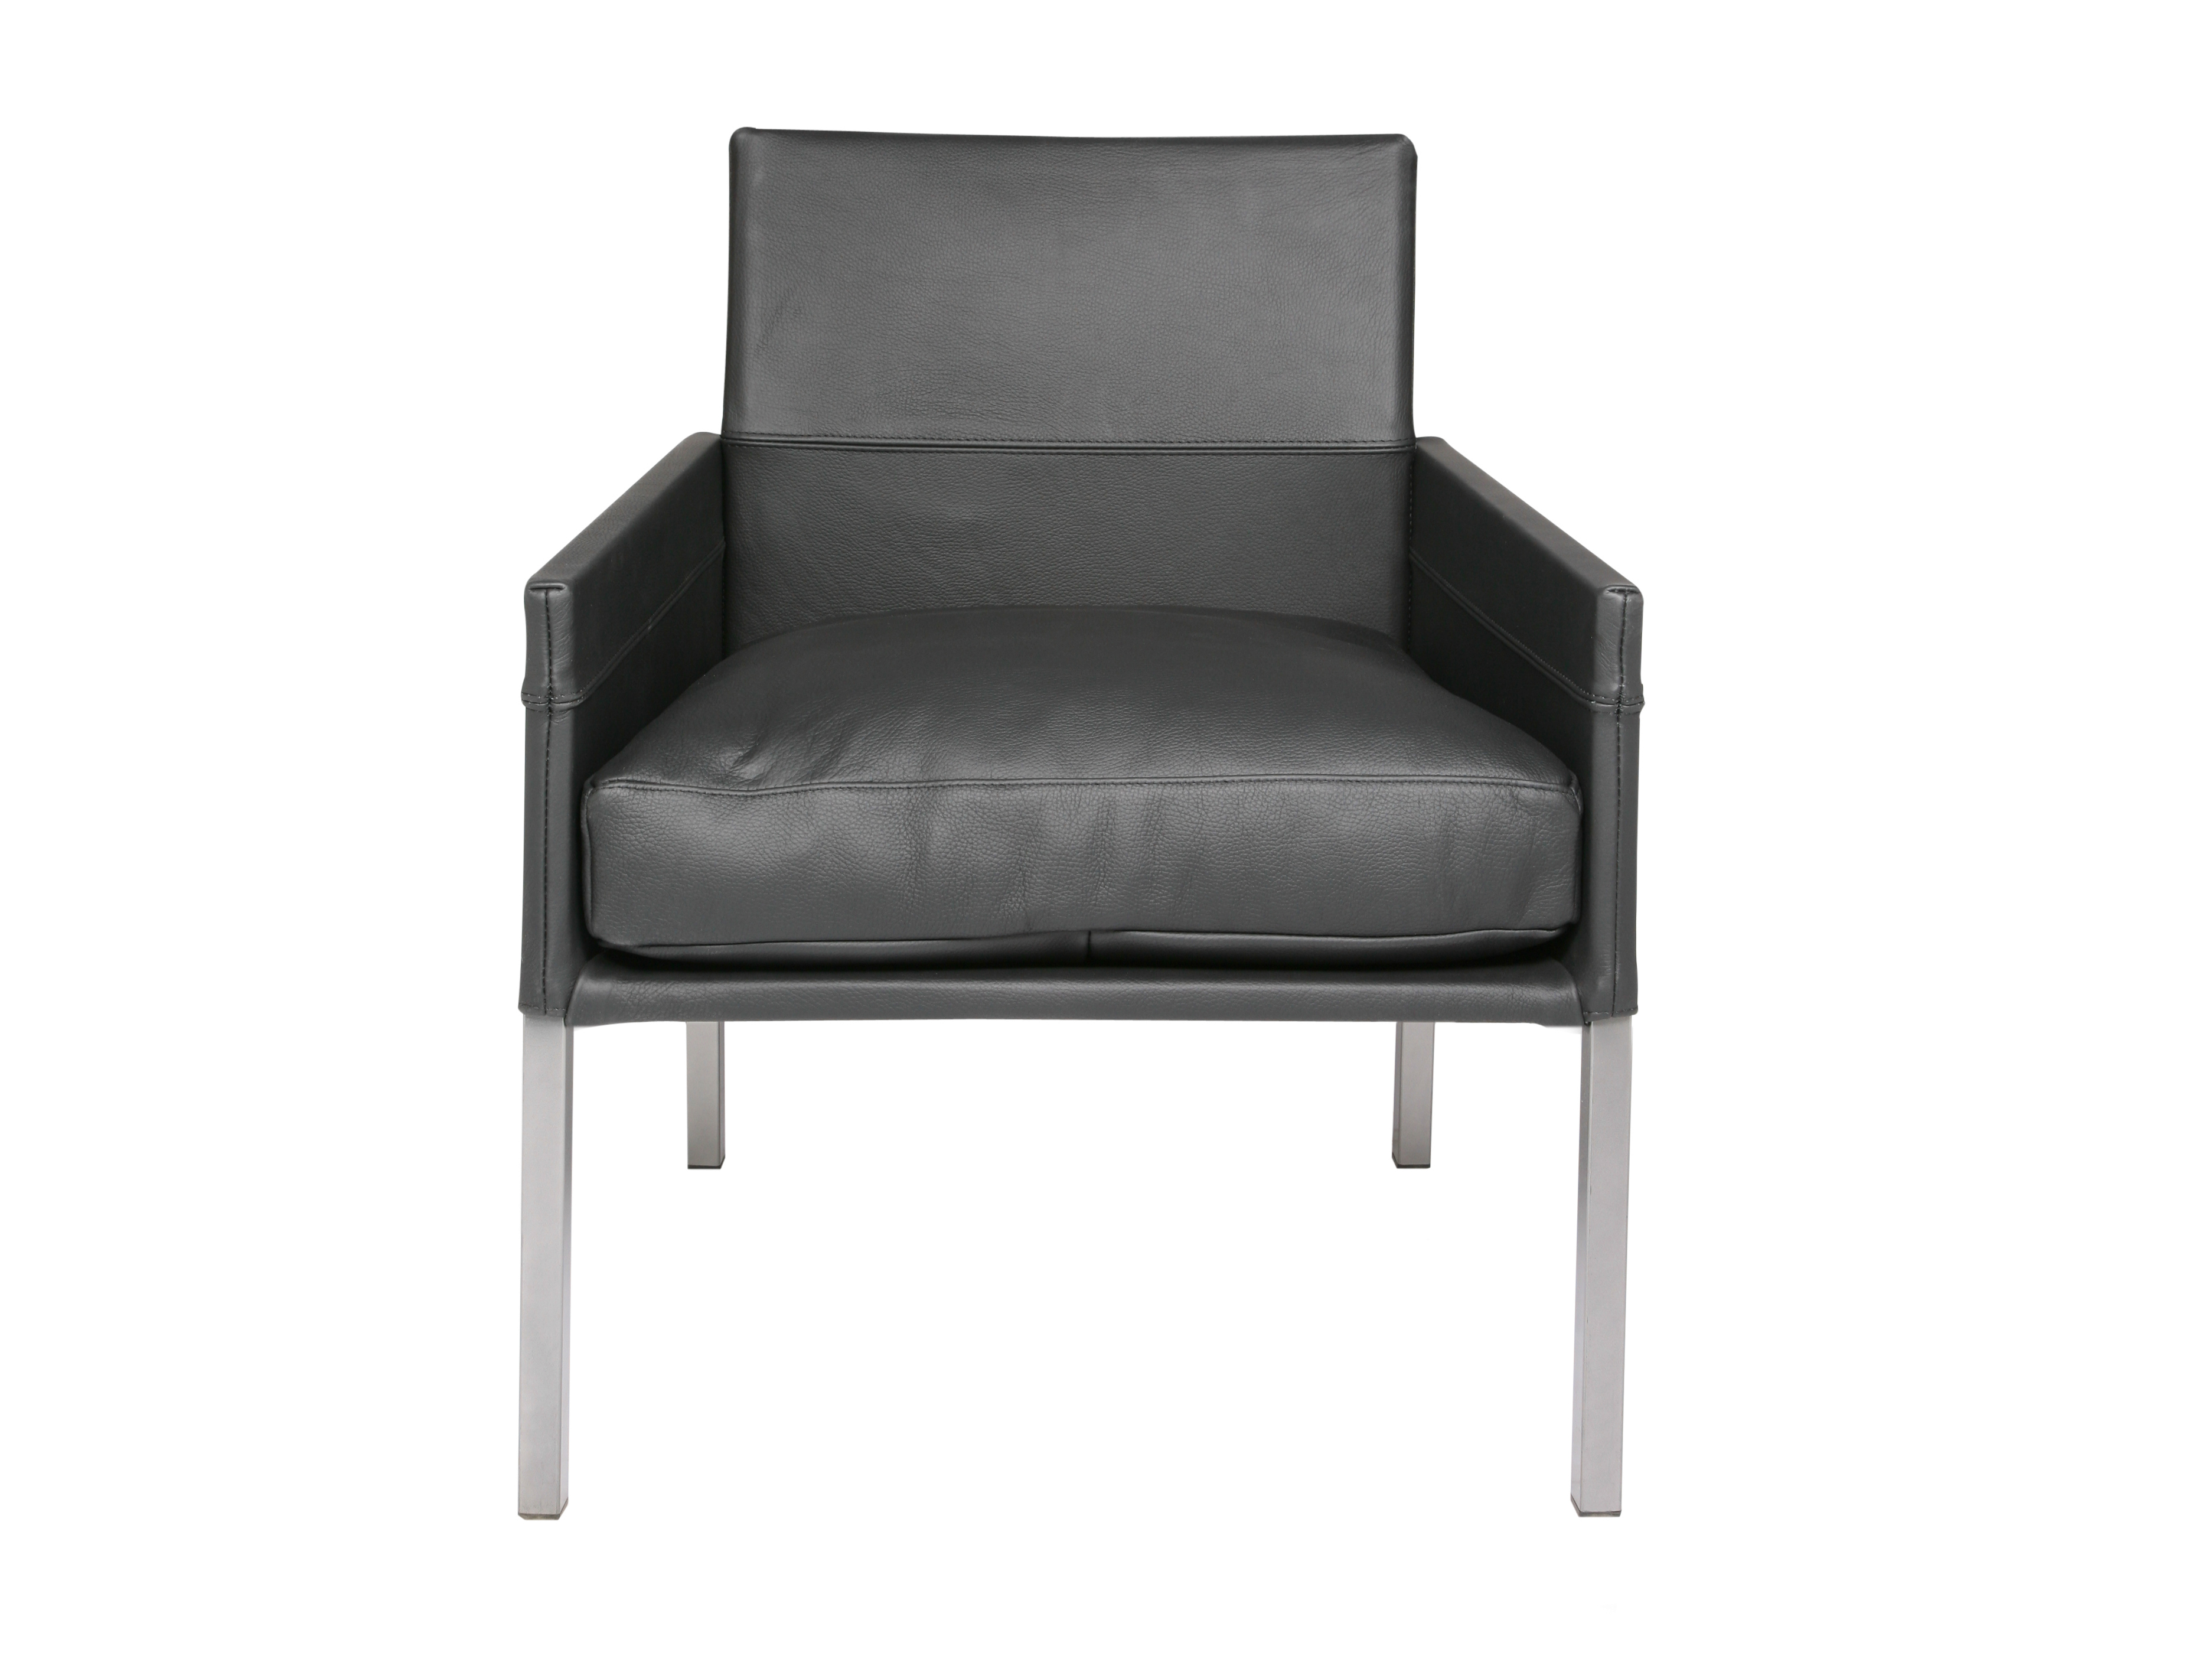 texas sessel mit armlehnen by kff. Black Bedroom Furniture Sets. Home Design Ideas